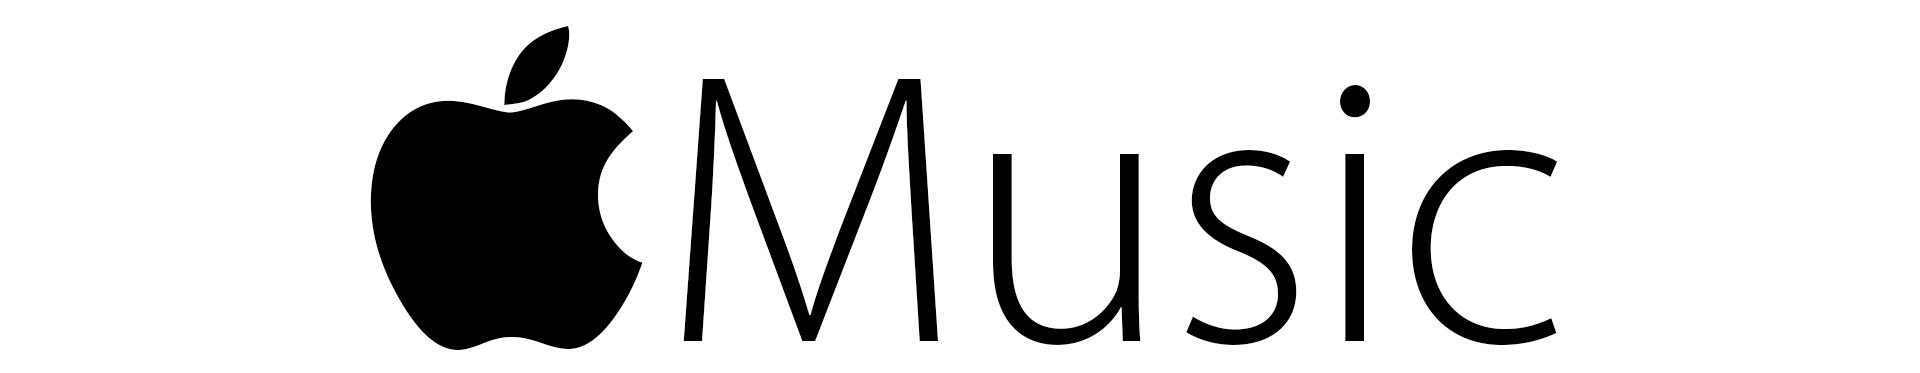 Apple-Music-logo-3.png